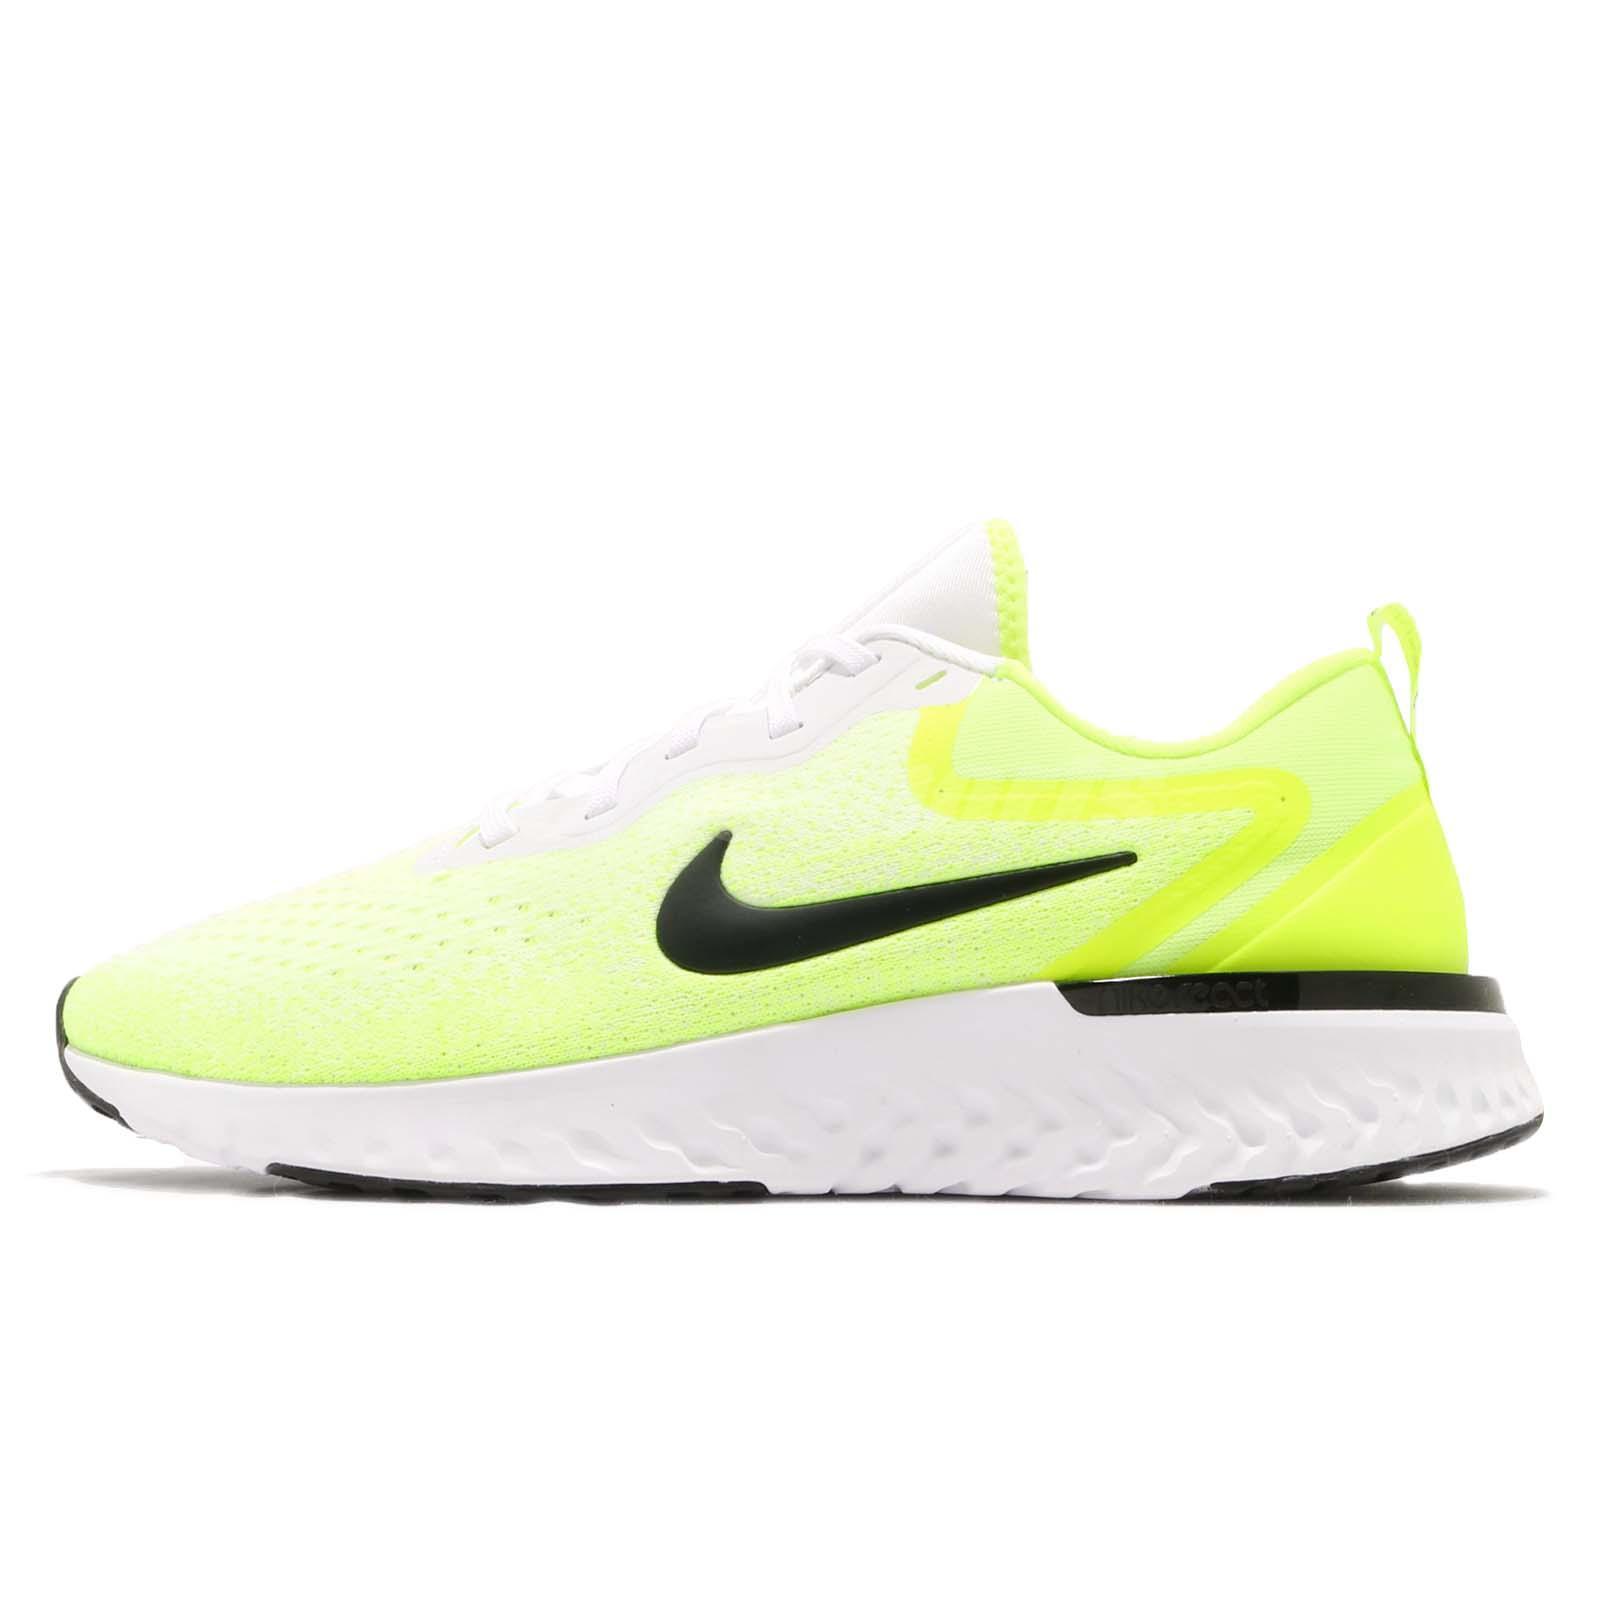 cda479fc0ae28 Nike Odyssey React White Black Volt Men Running Training Shoe Sneaker AO9819 -103